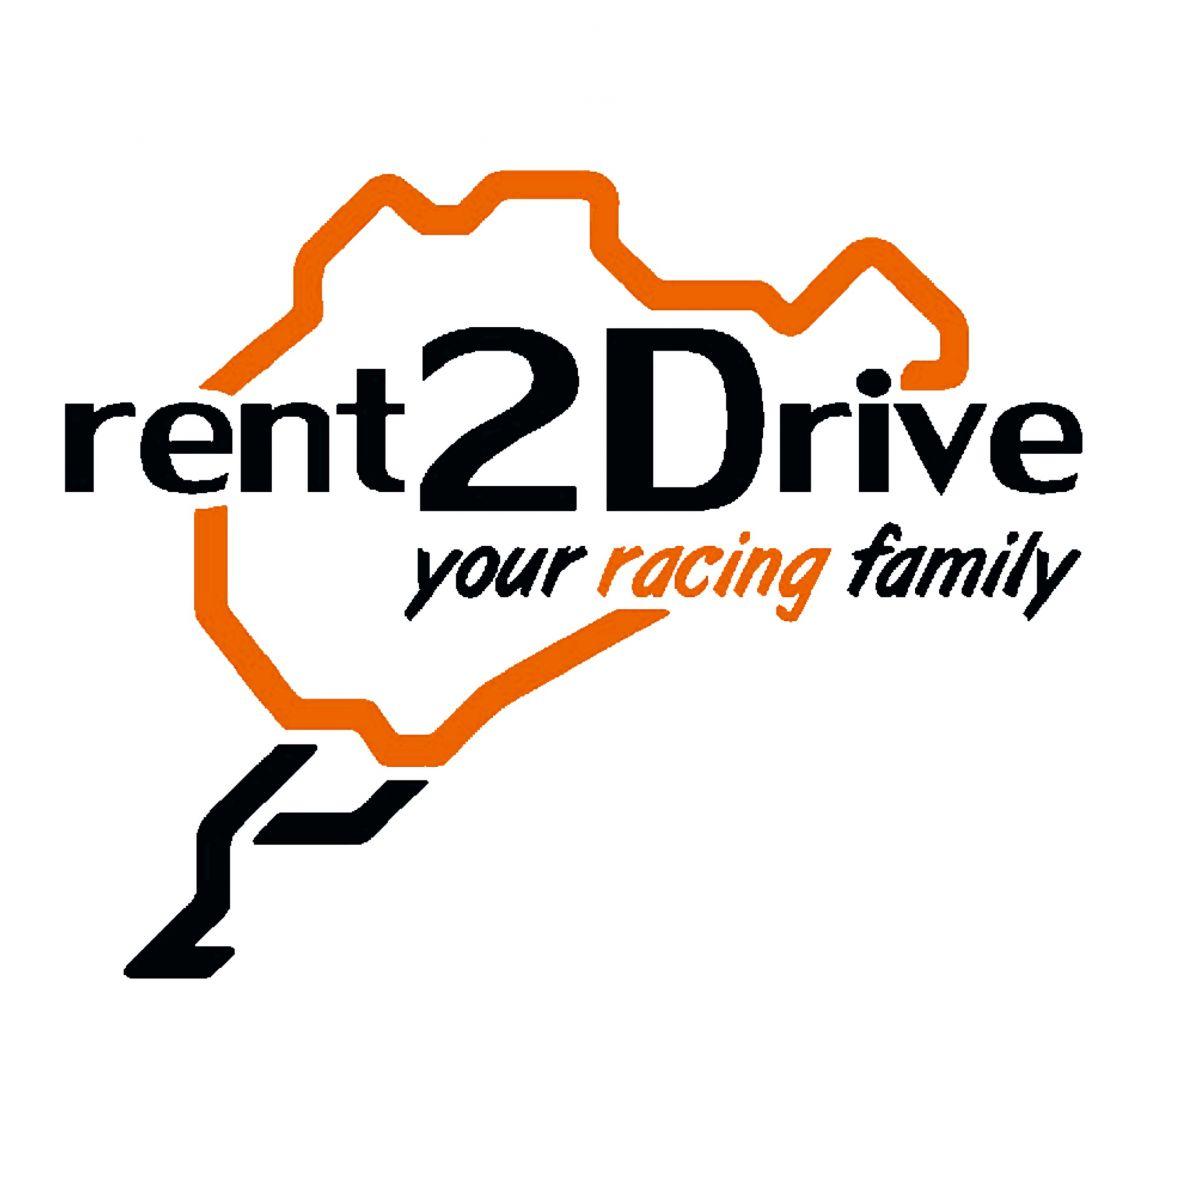 rent2drive-racing